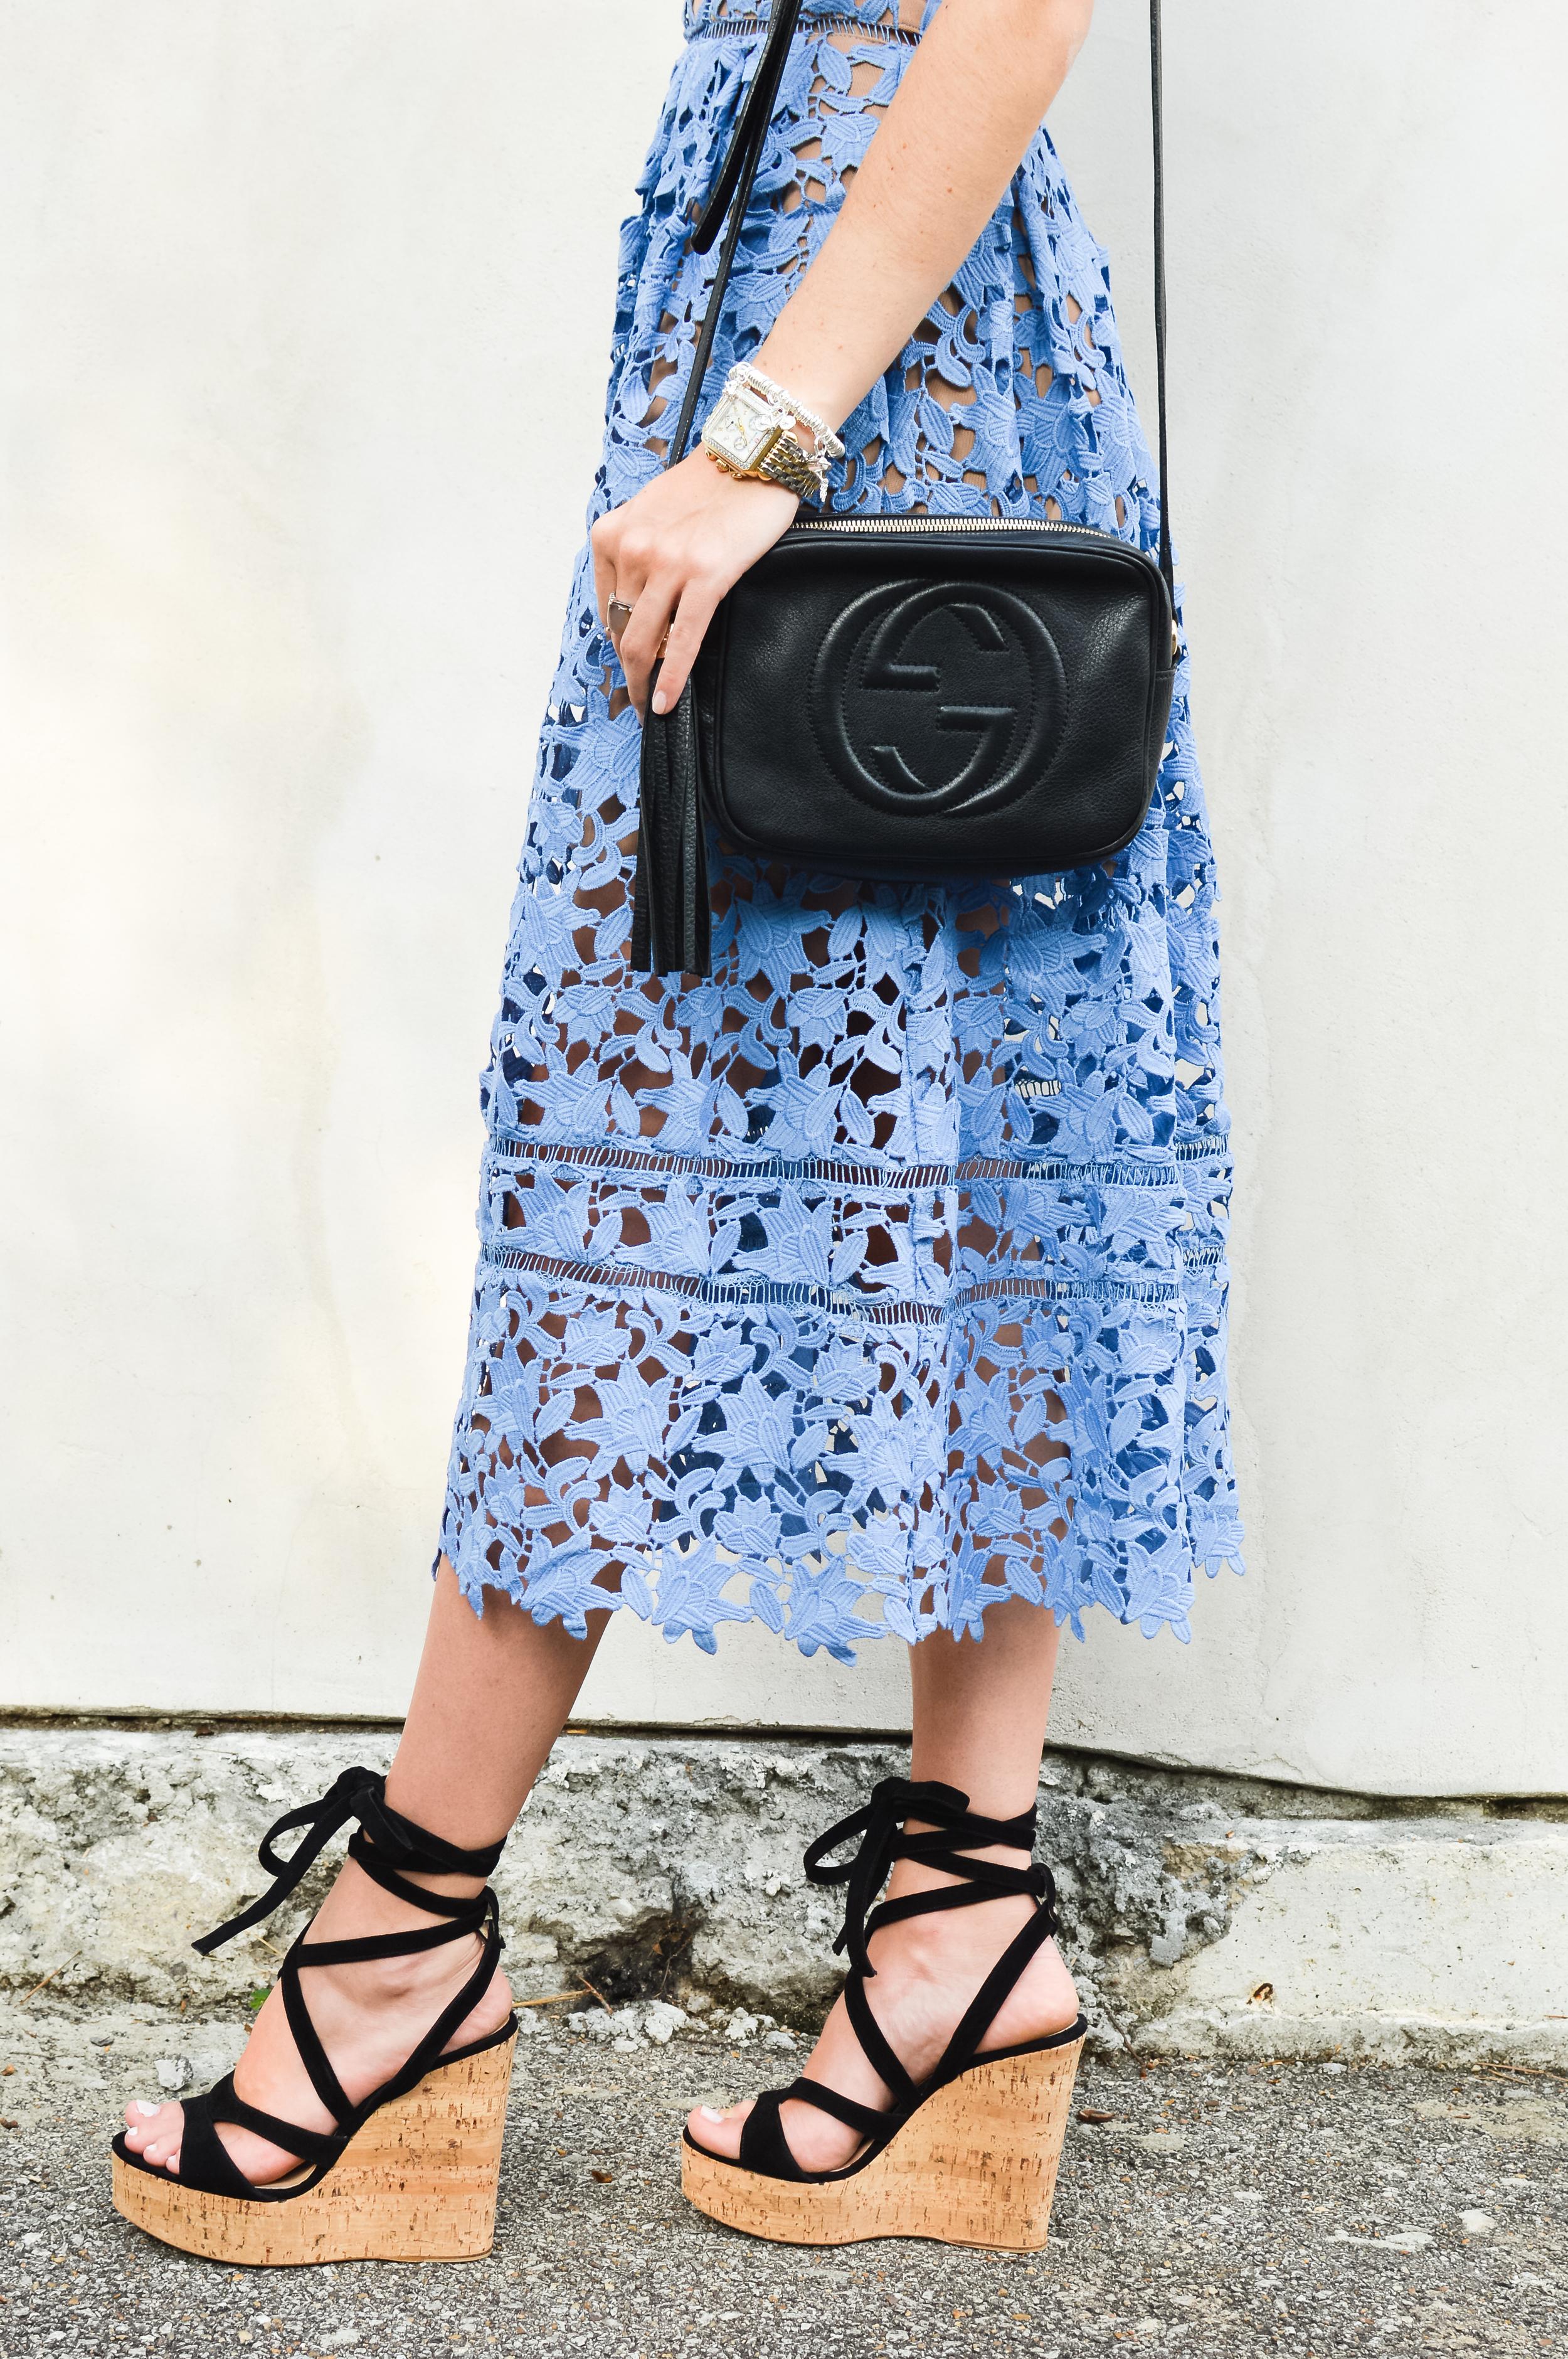 lcb_style_fashion_blogger_selfportrait_dress (47 of 48).jpg